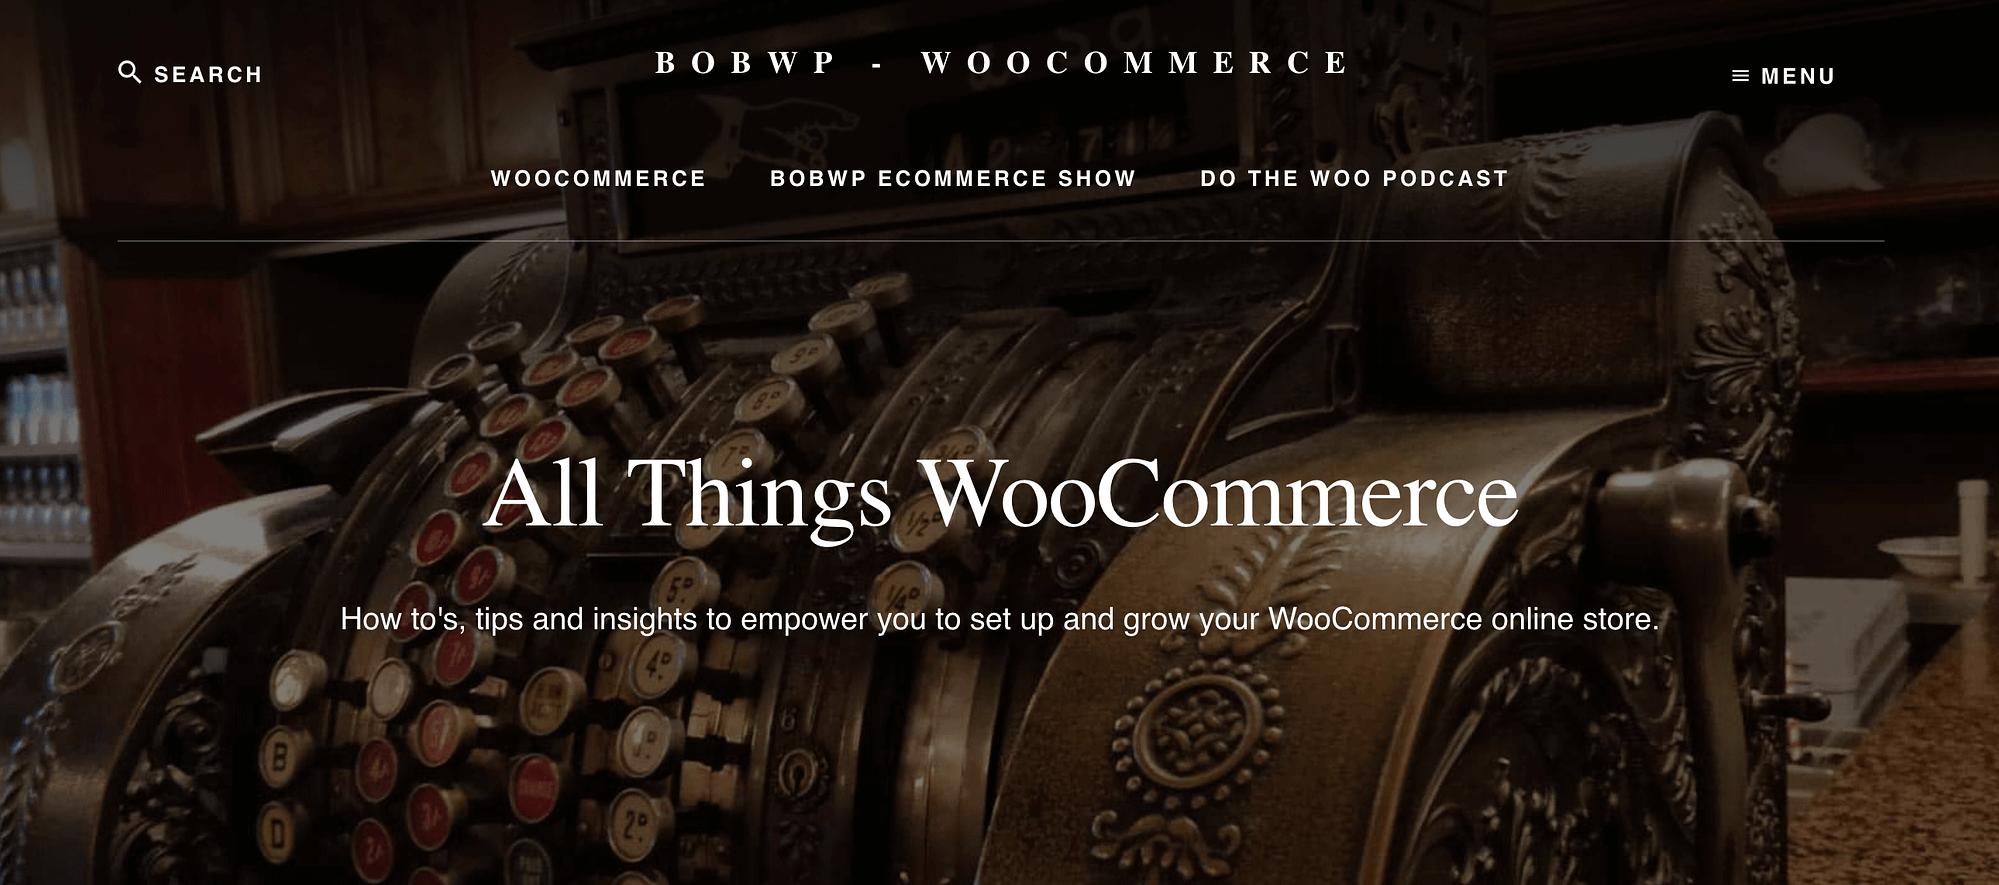 El blog BobWP.